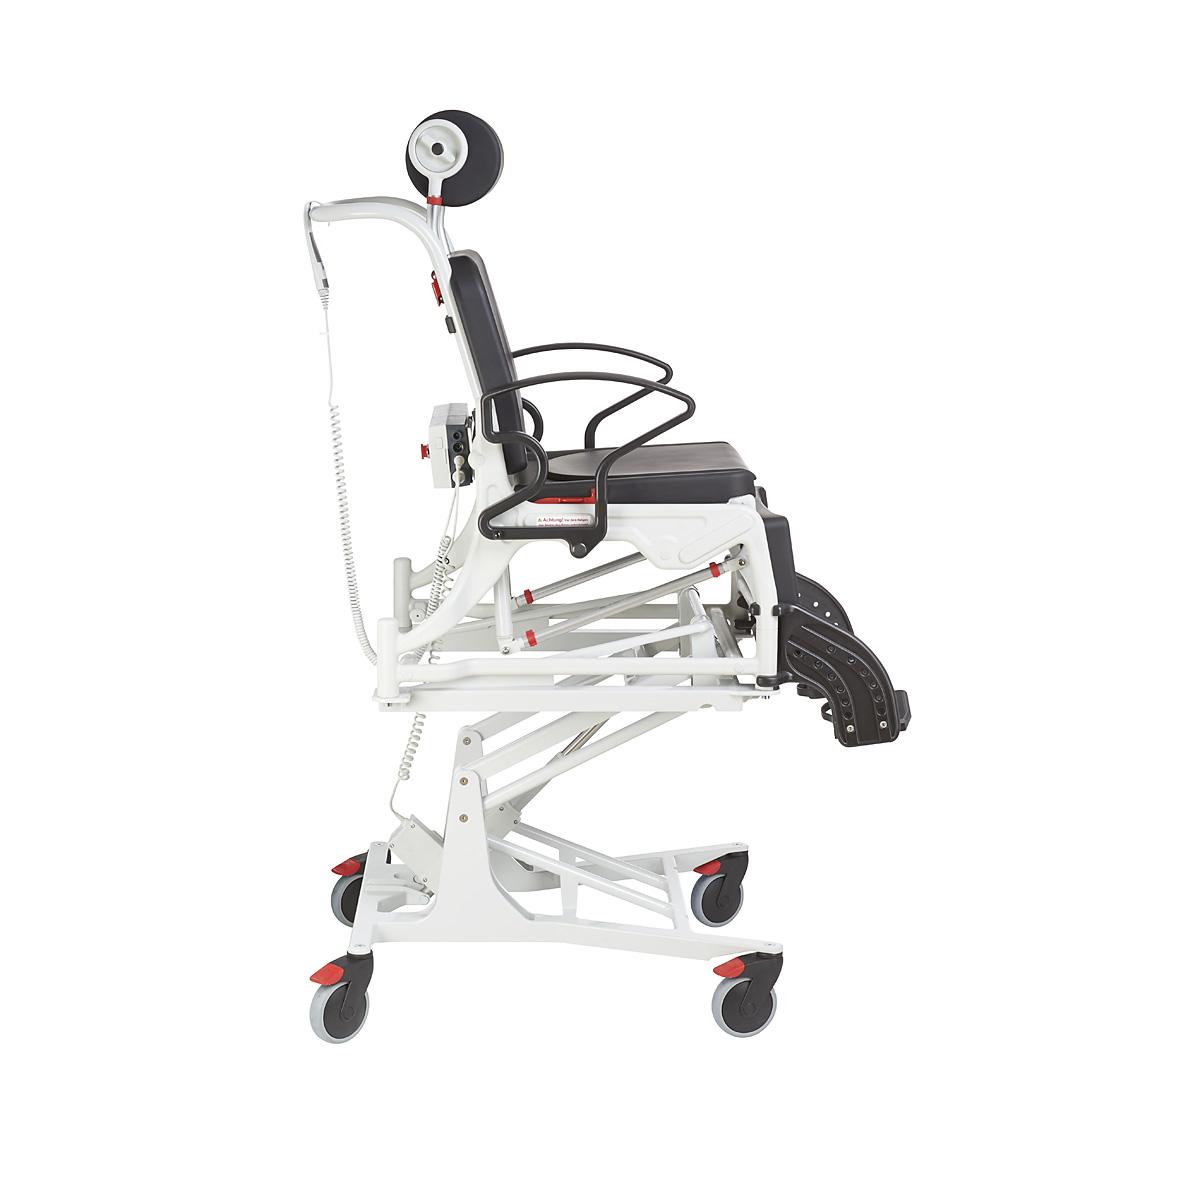 Rebotec Phoenix Multi - Electric Tilt & Lift Power Commode Shower Chair